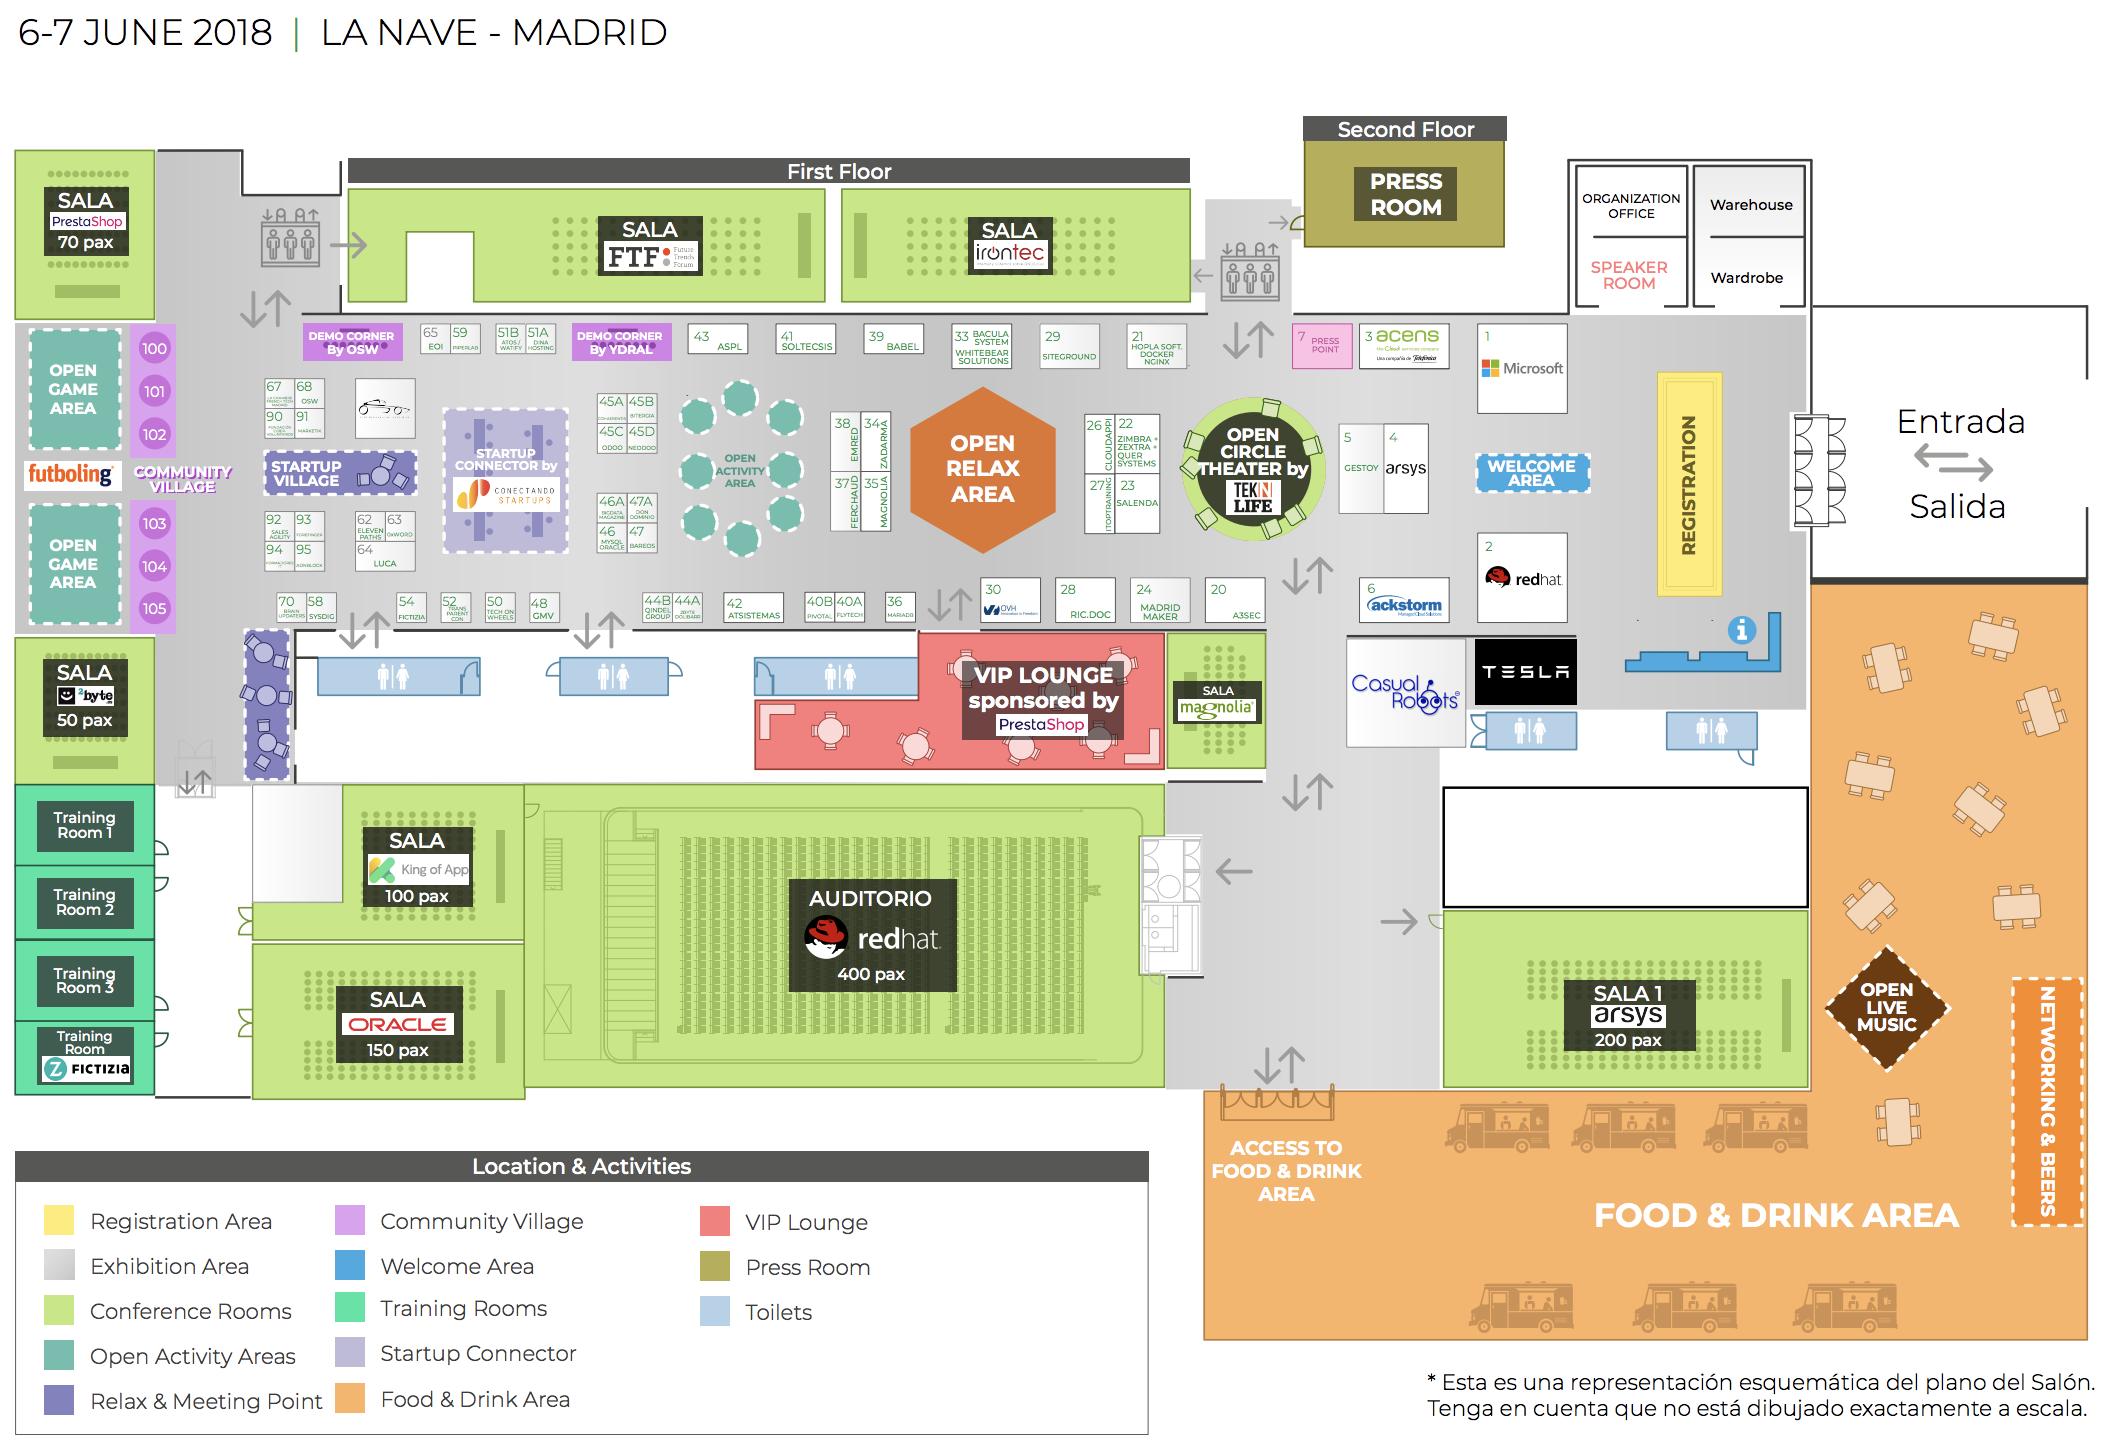 OpenExpo Europe 2018 - Conference Floor Plan